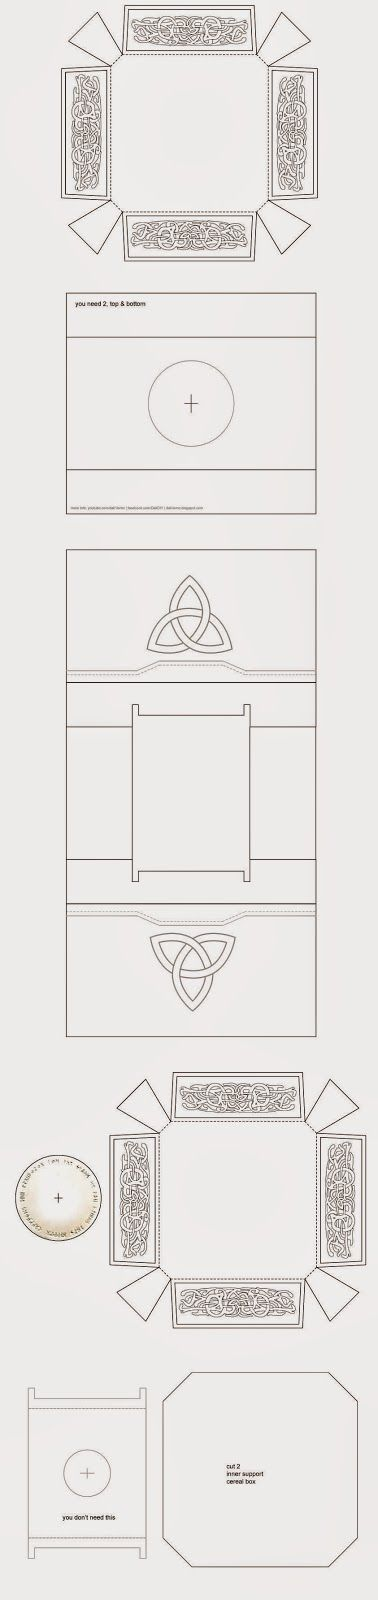 dali-lomo: Thor Hammer - Mjölnir Cardboard DIY (free template) - part 1 http://youtu.be/7U8Sx__CQkk